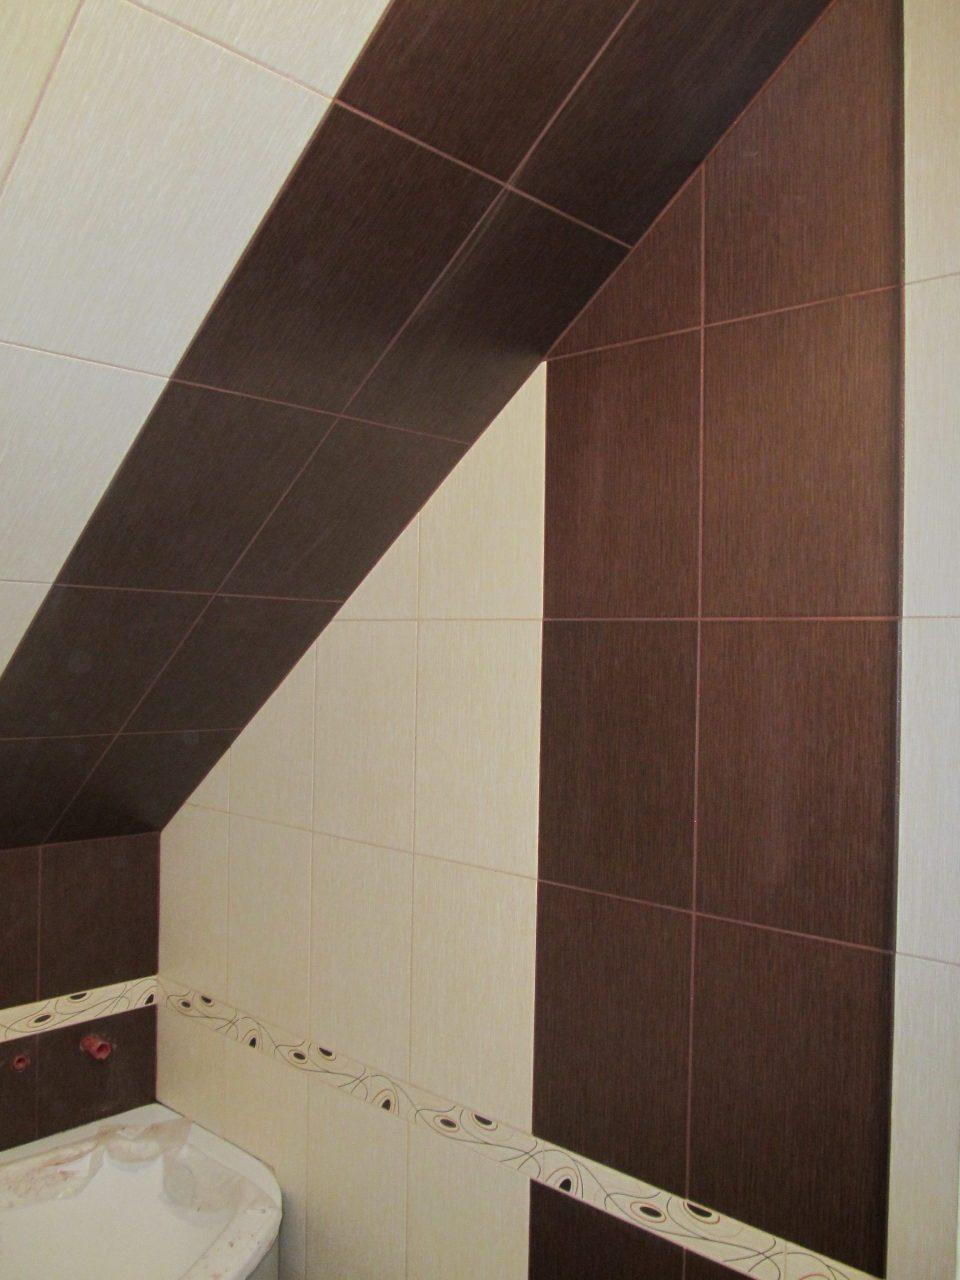 +375336069302 МТС Виталий - Облицовка плиткой потолка